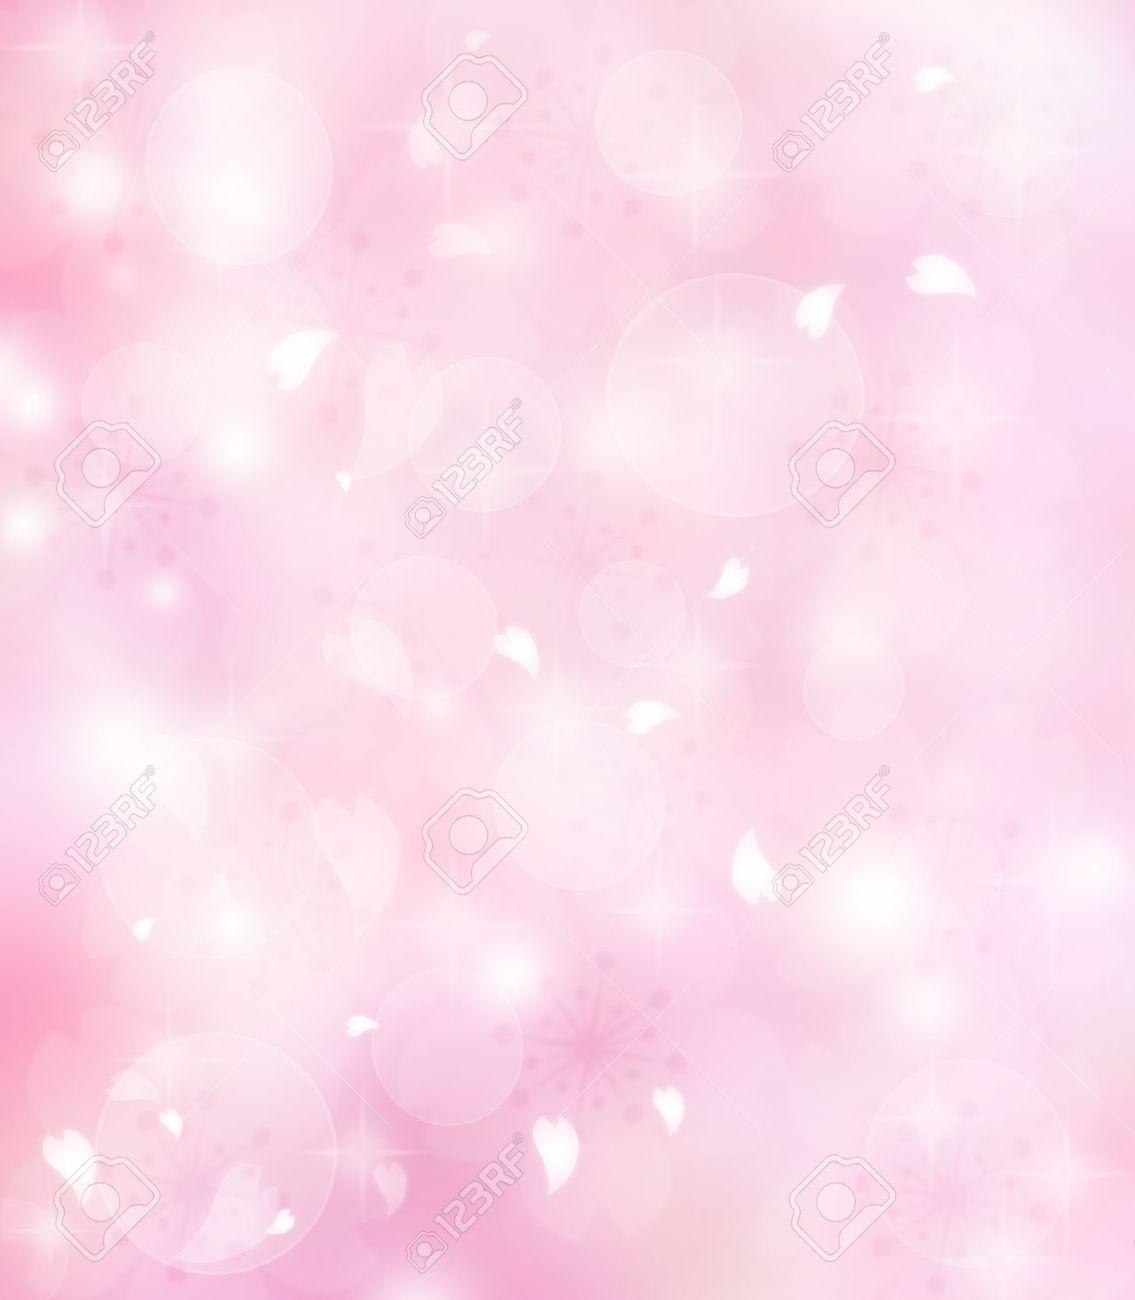 Pink flower petals background stock photo picture and royalty free pink flower petals background mightylinksfo Gallery